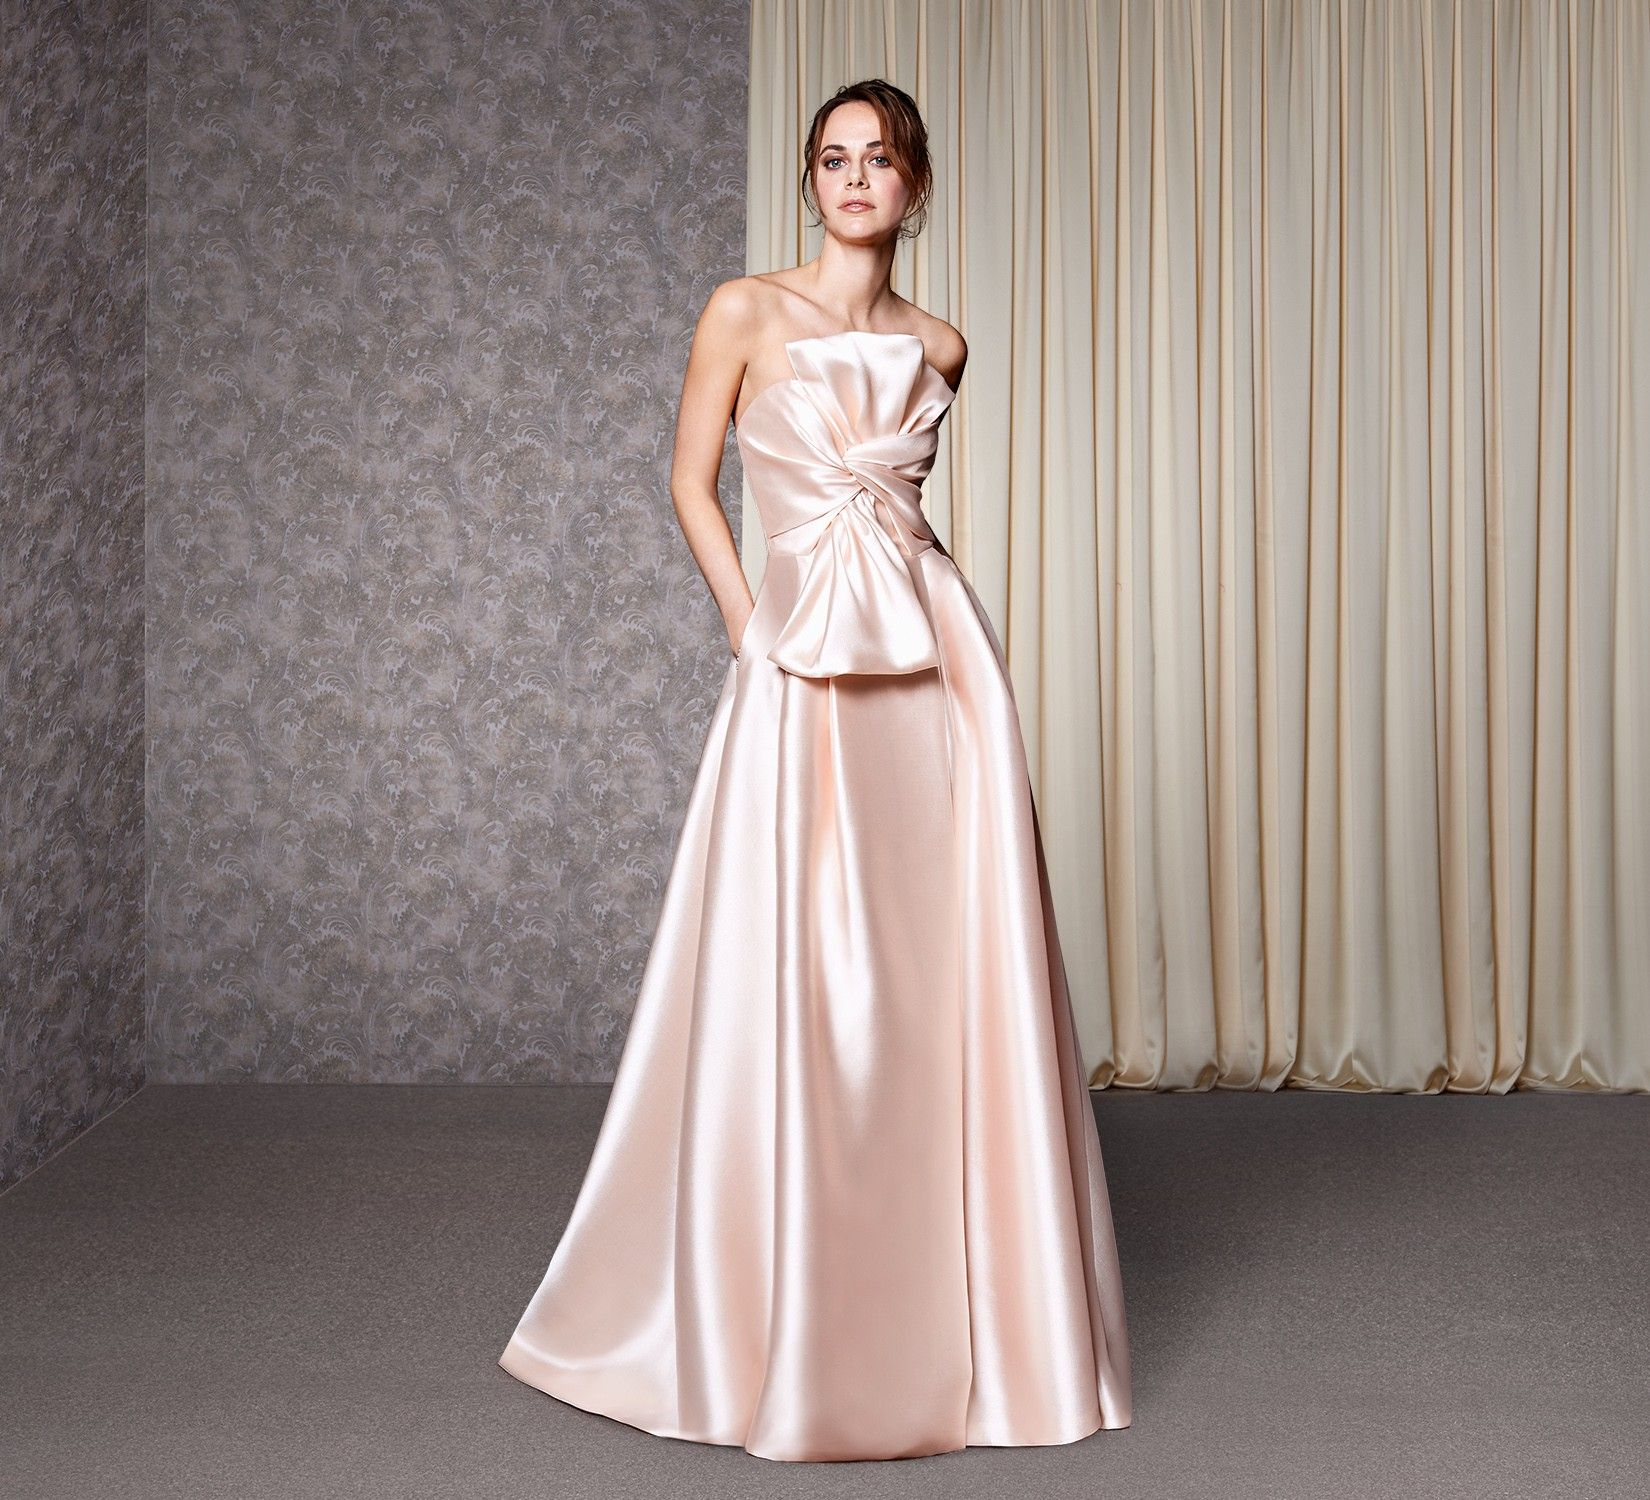 Zelda wedding dress  abito da sposa  Cosas para comprar  Pinterest  Atelier